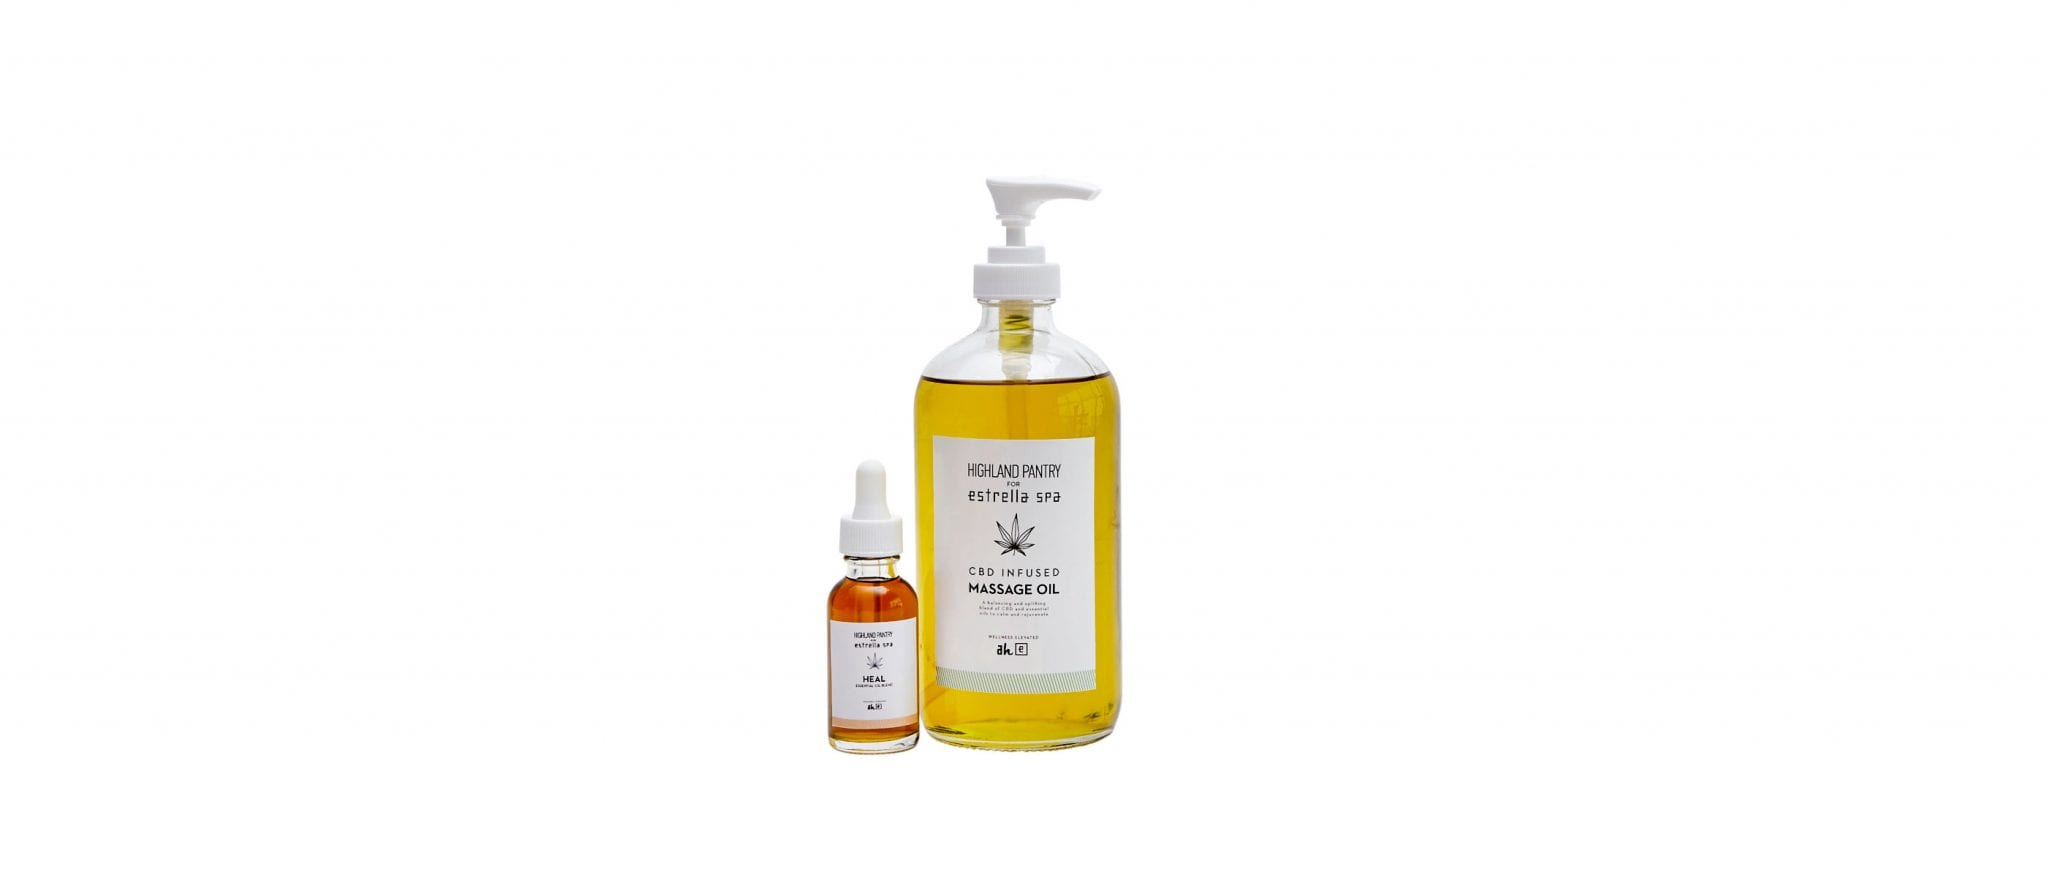 Heal Essential Oil + CBD Infused Massage Oil